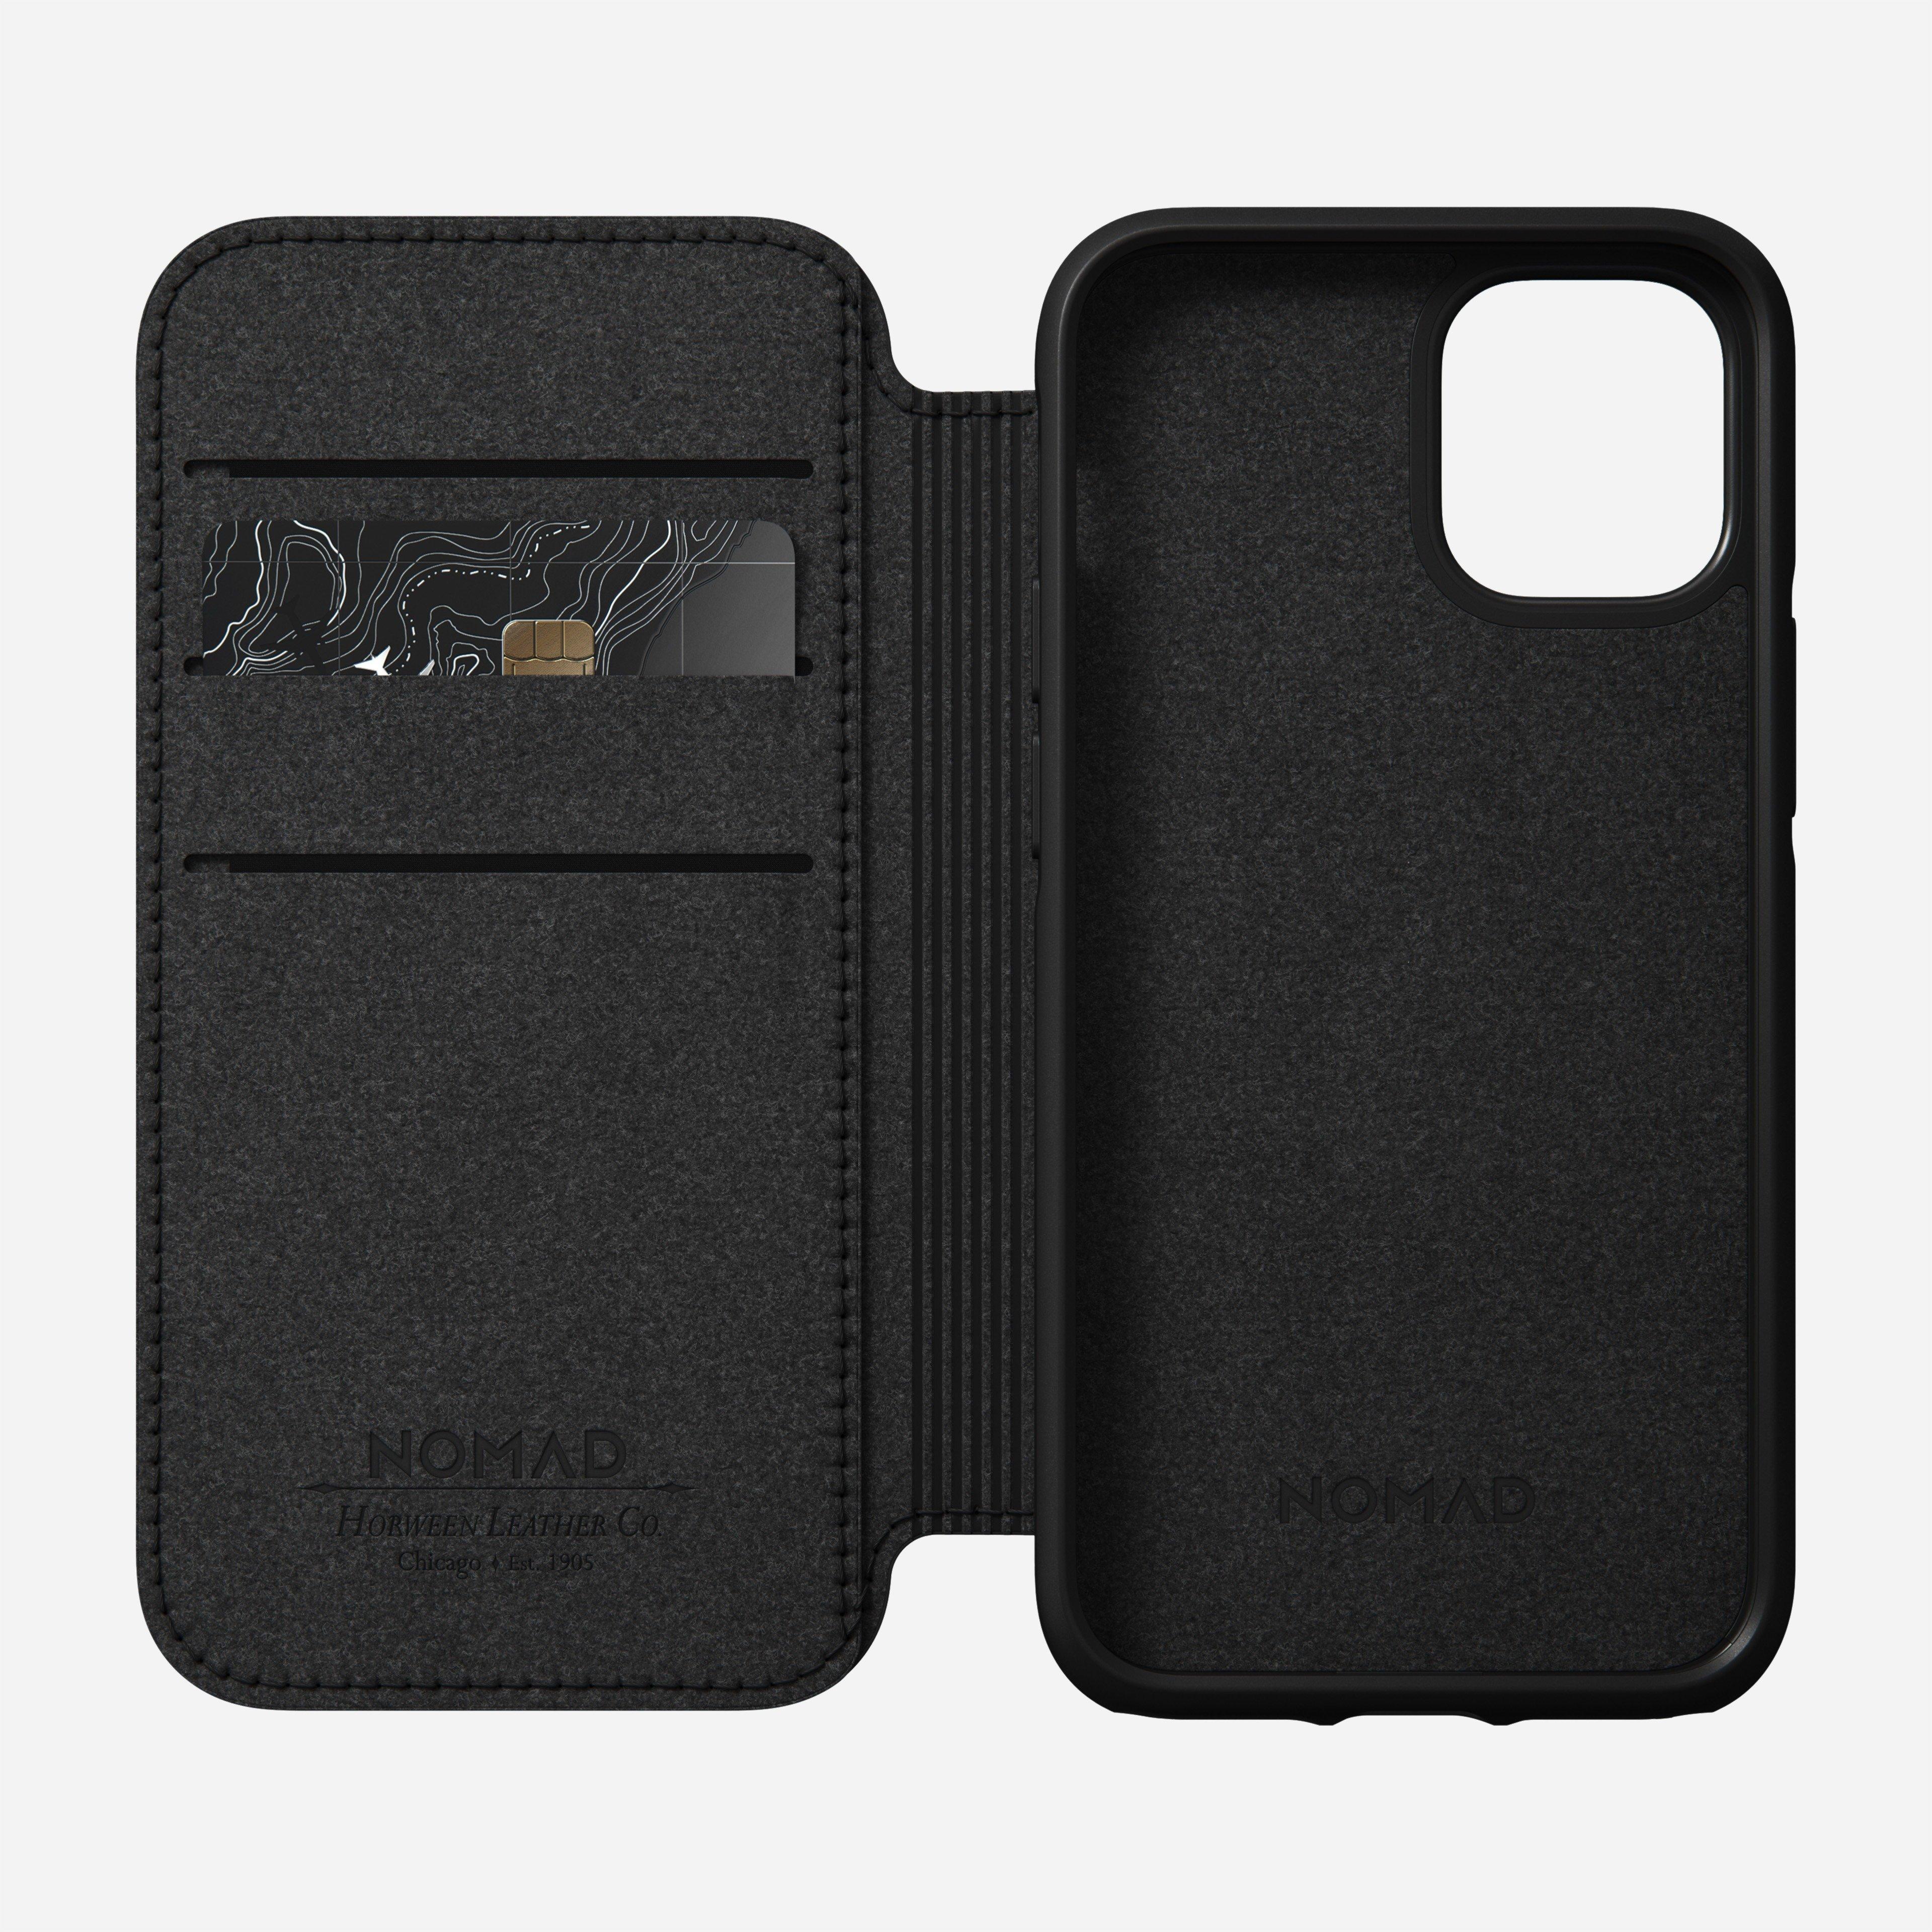 Rugged folio horween leather black iphone 12 mini